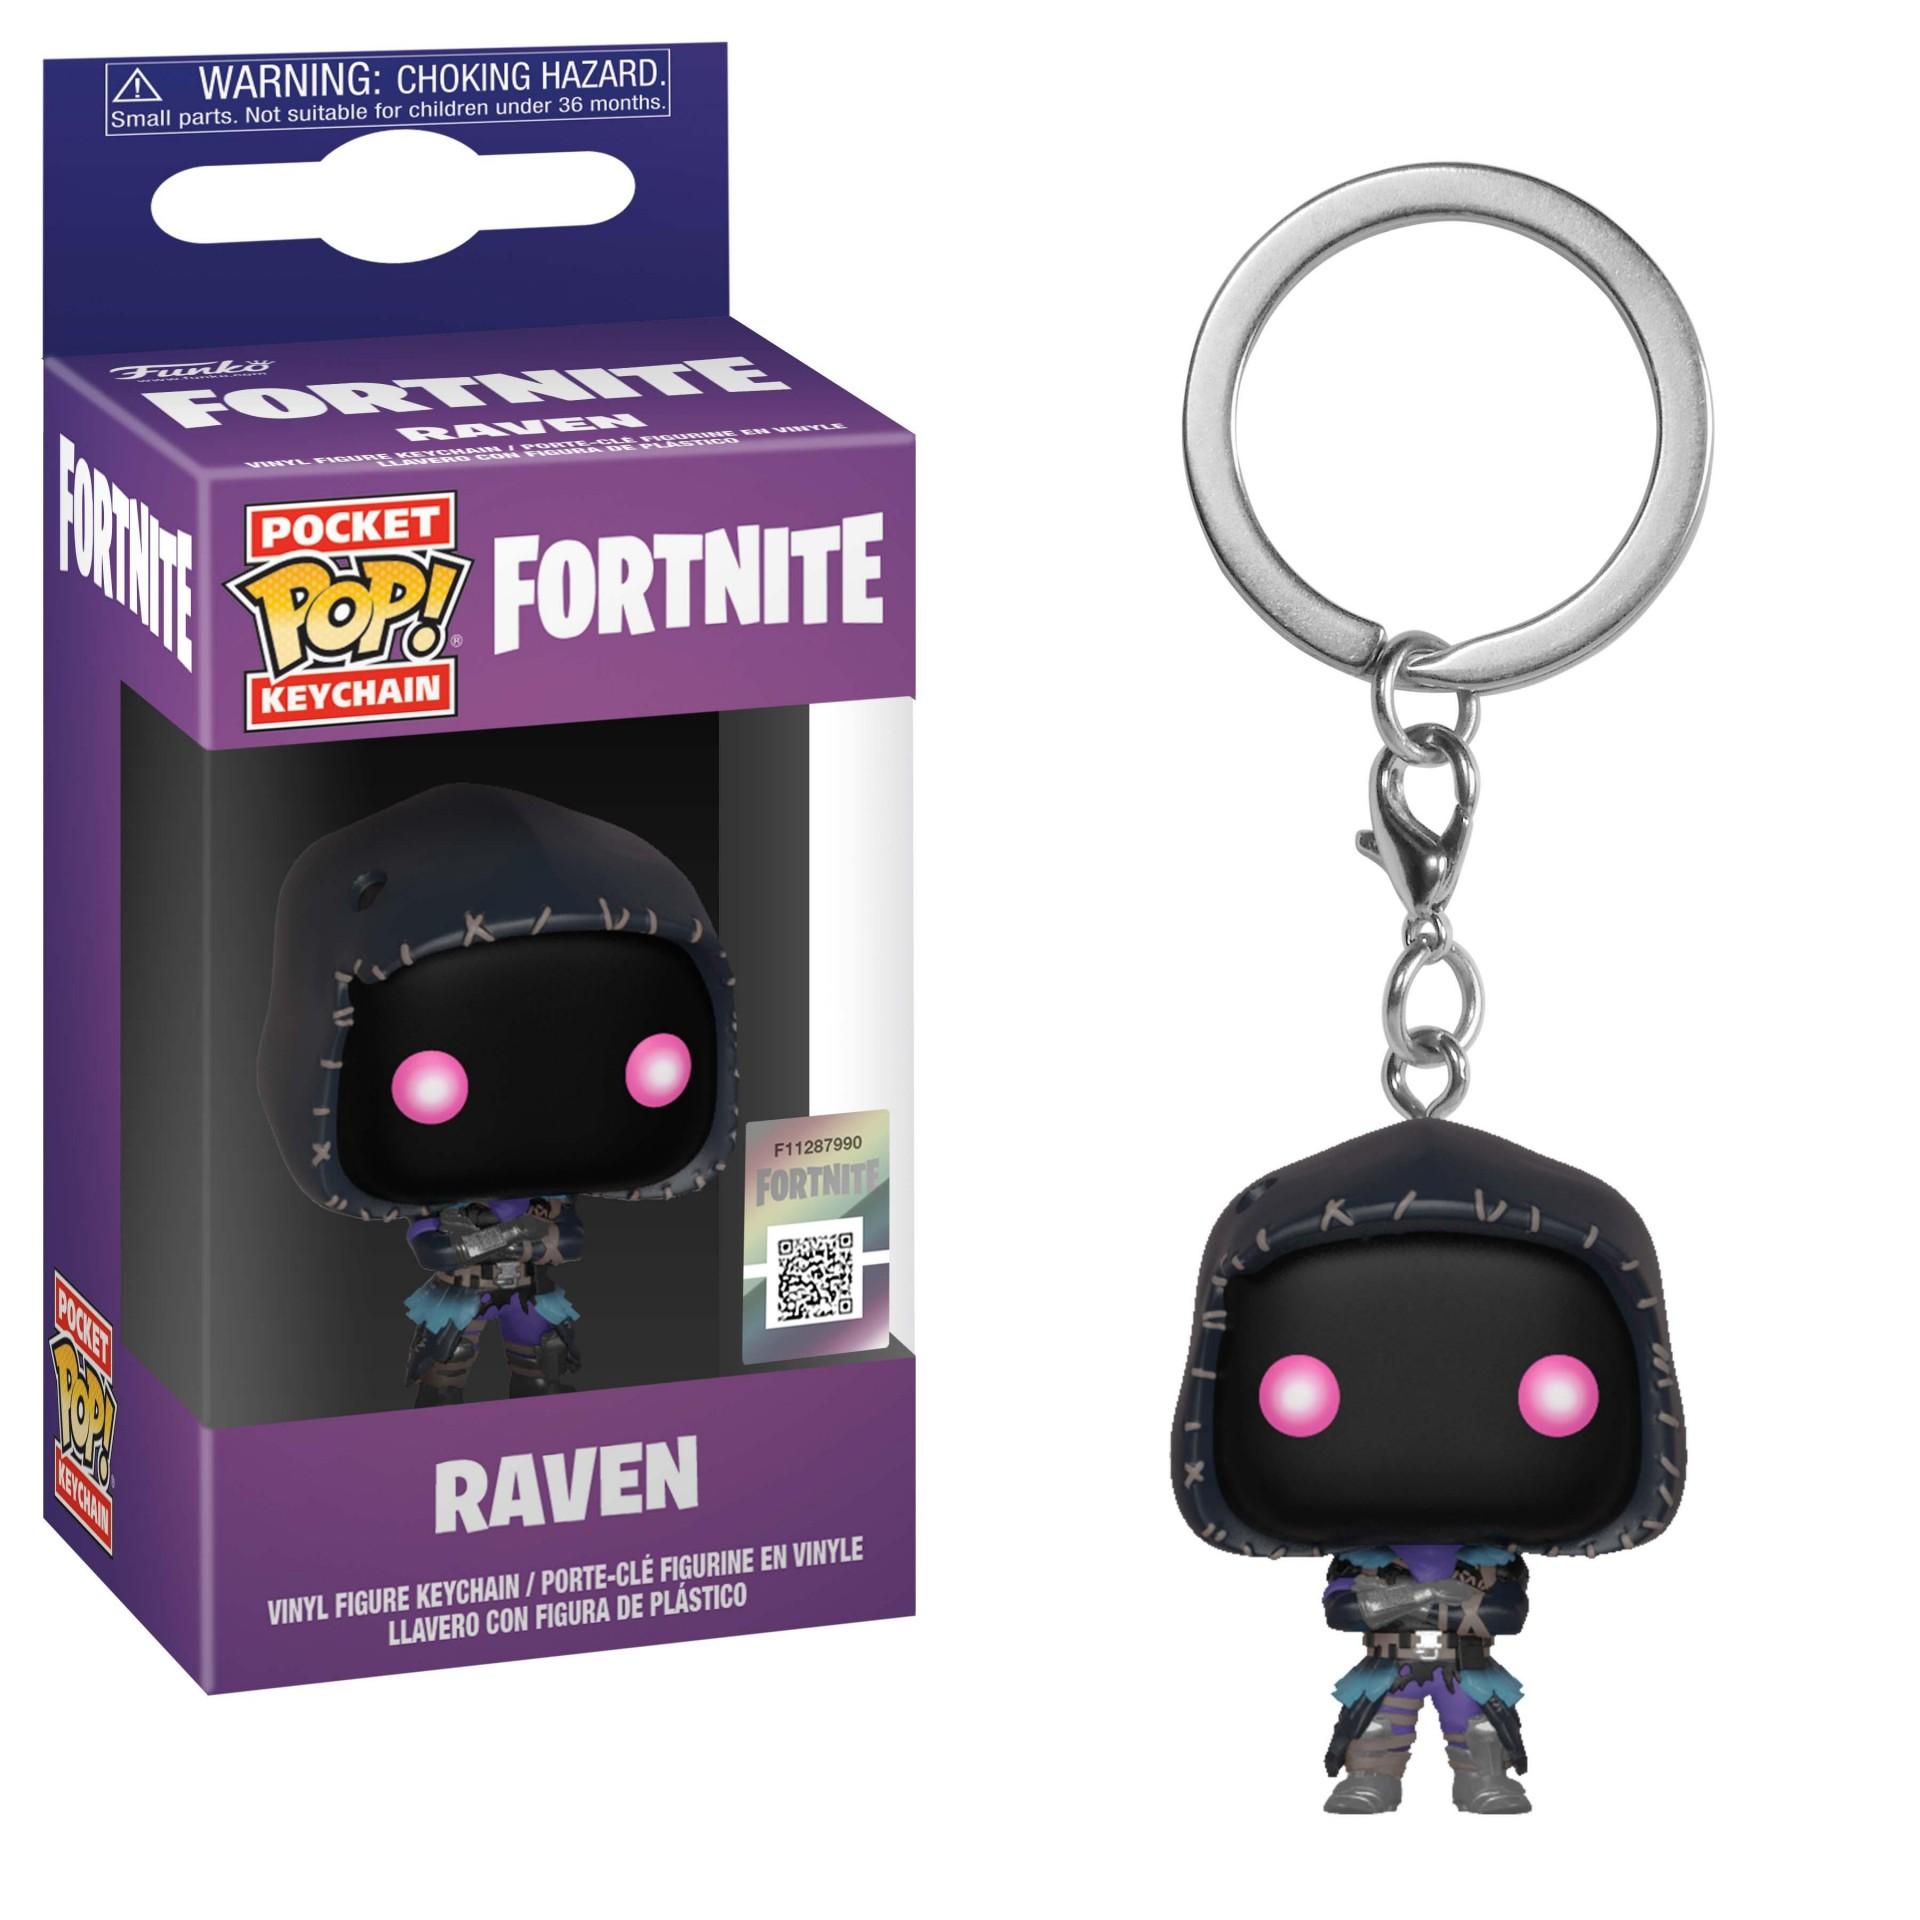 Funko Pocket POP! Keychain Fortnite Raven